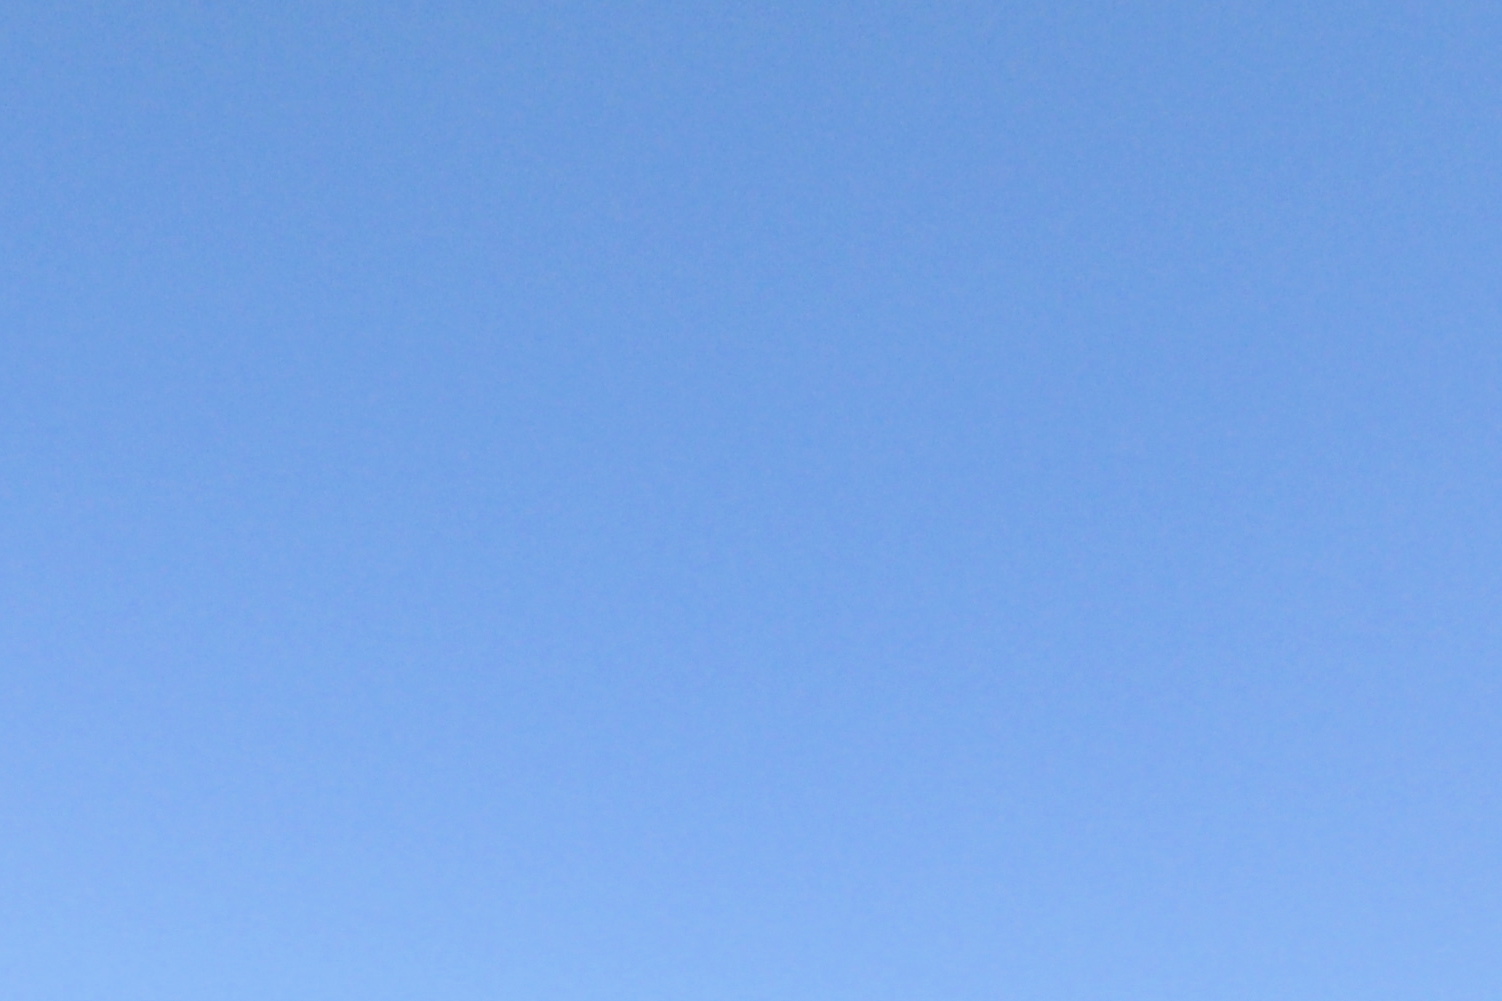 2010-07-25-Pure_Blue_Sky.jpg